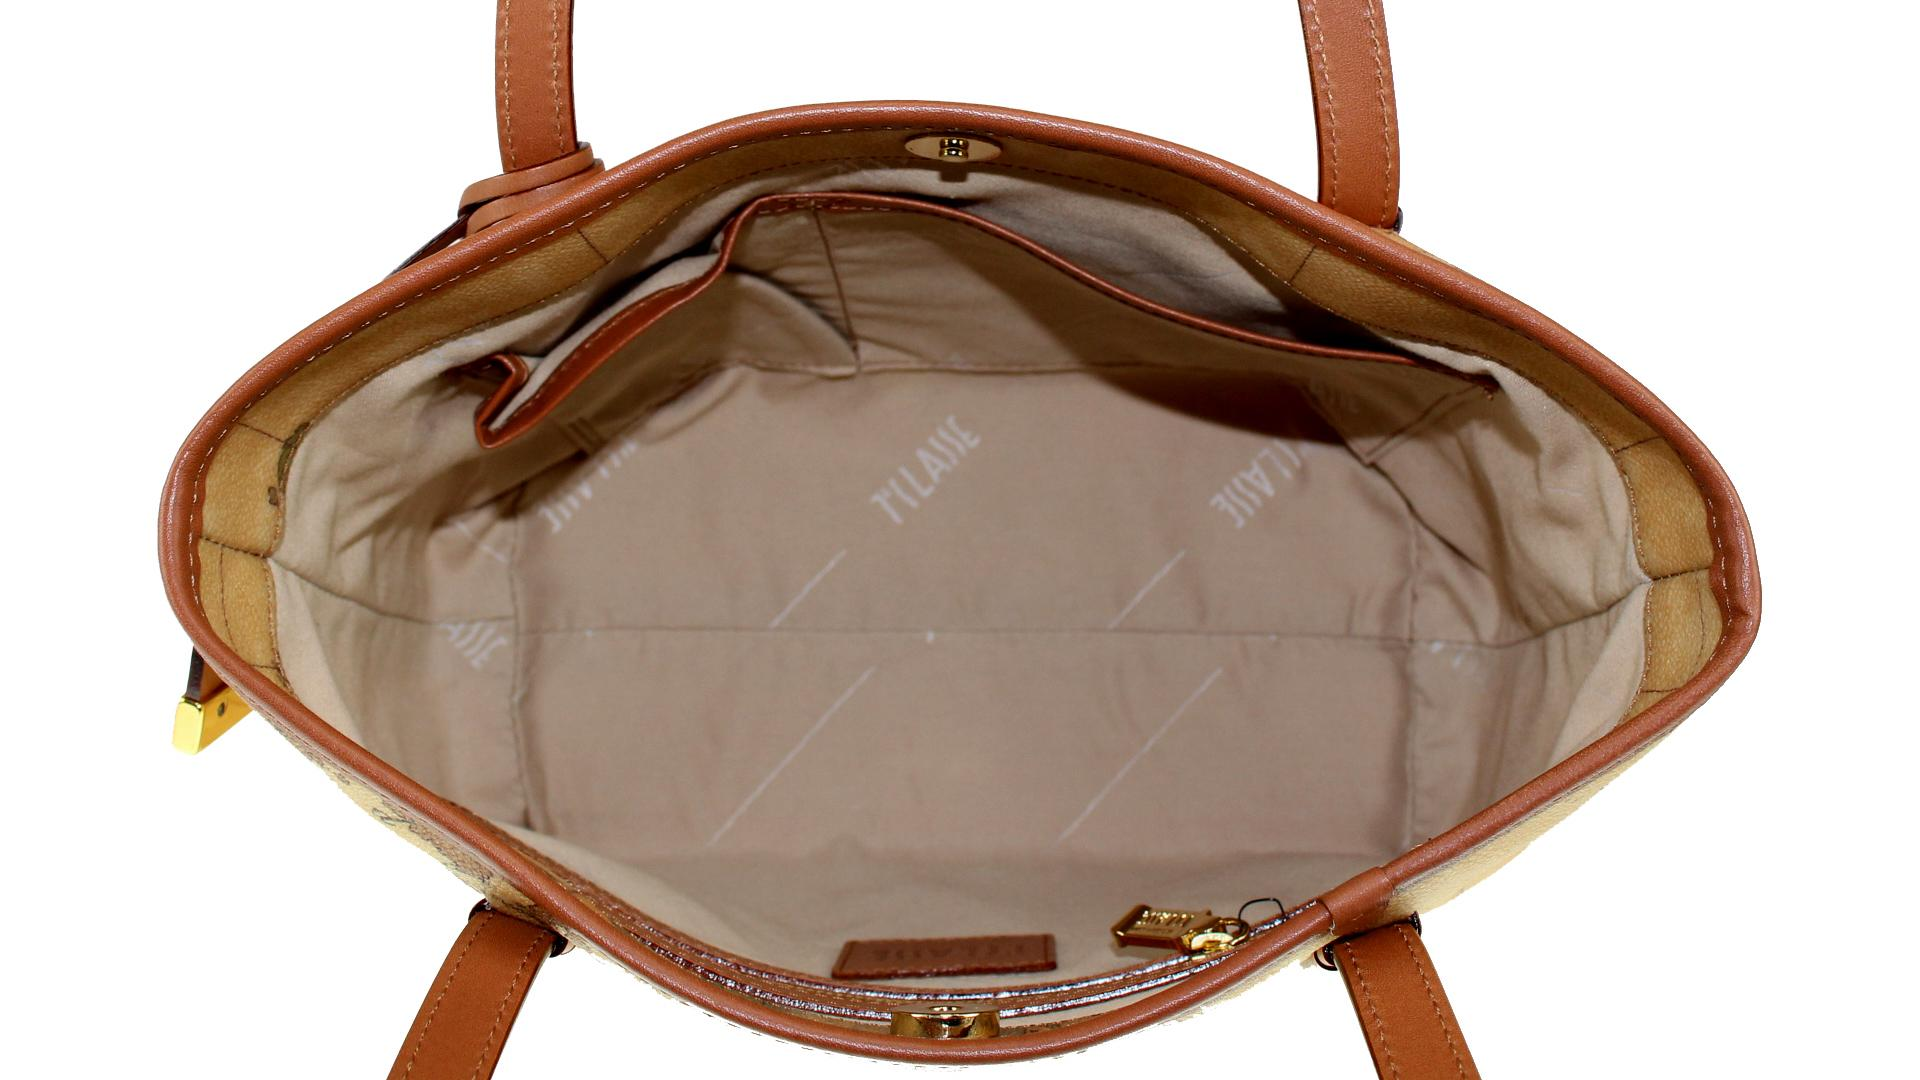 Shopping bag  Alviero Martini 1A Classe New Basic D003 6000 010 Classico